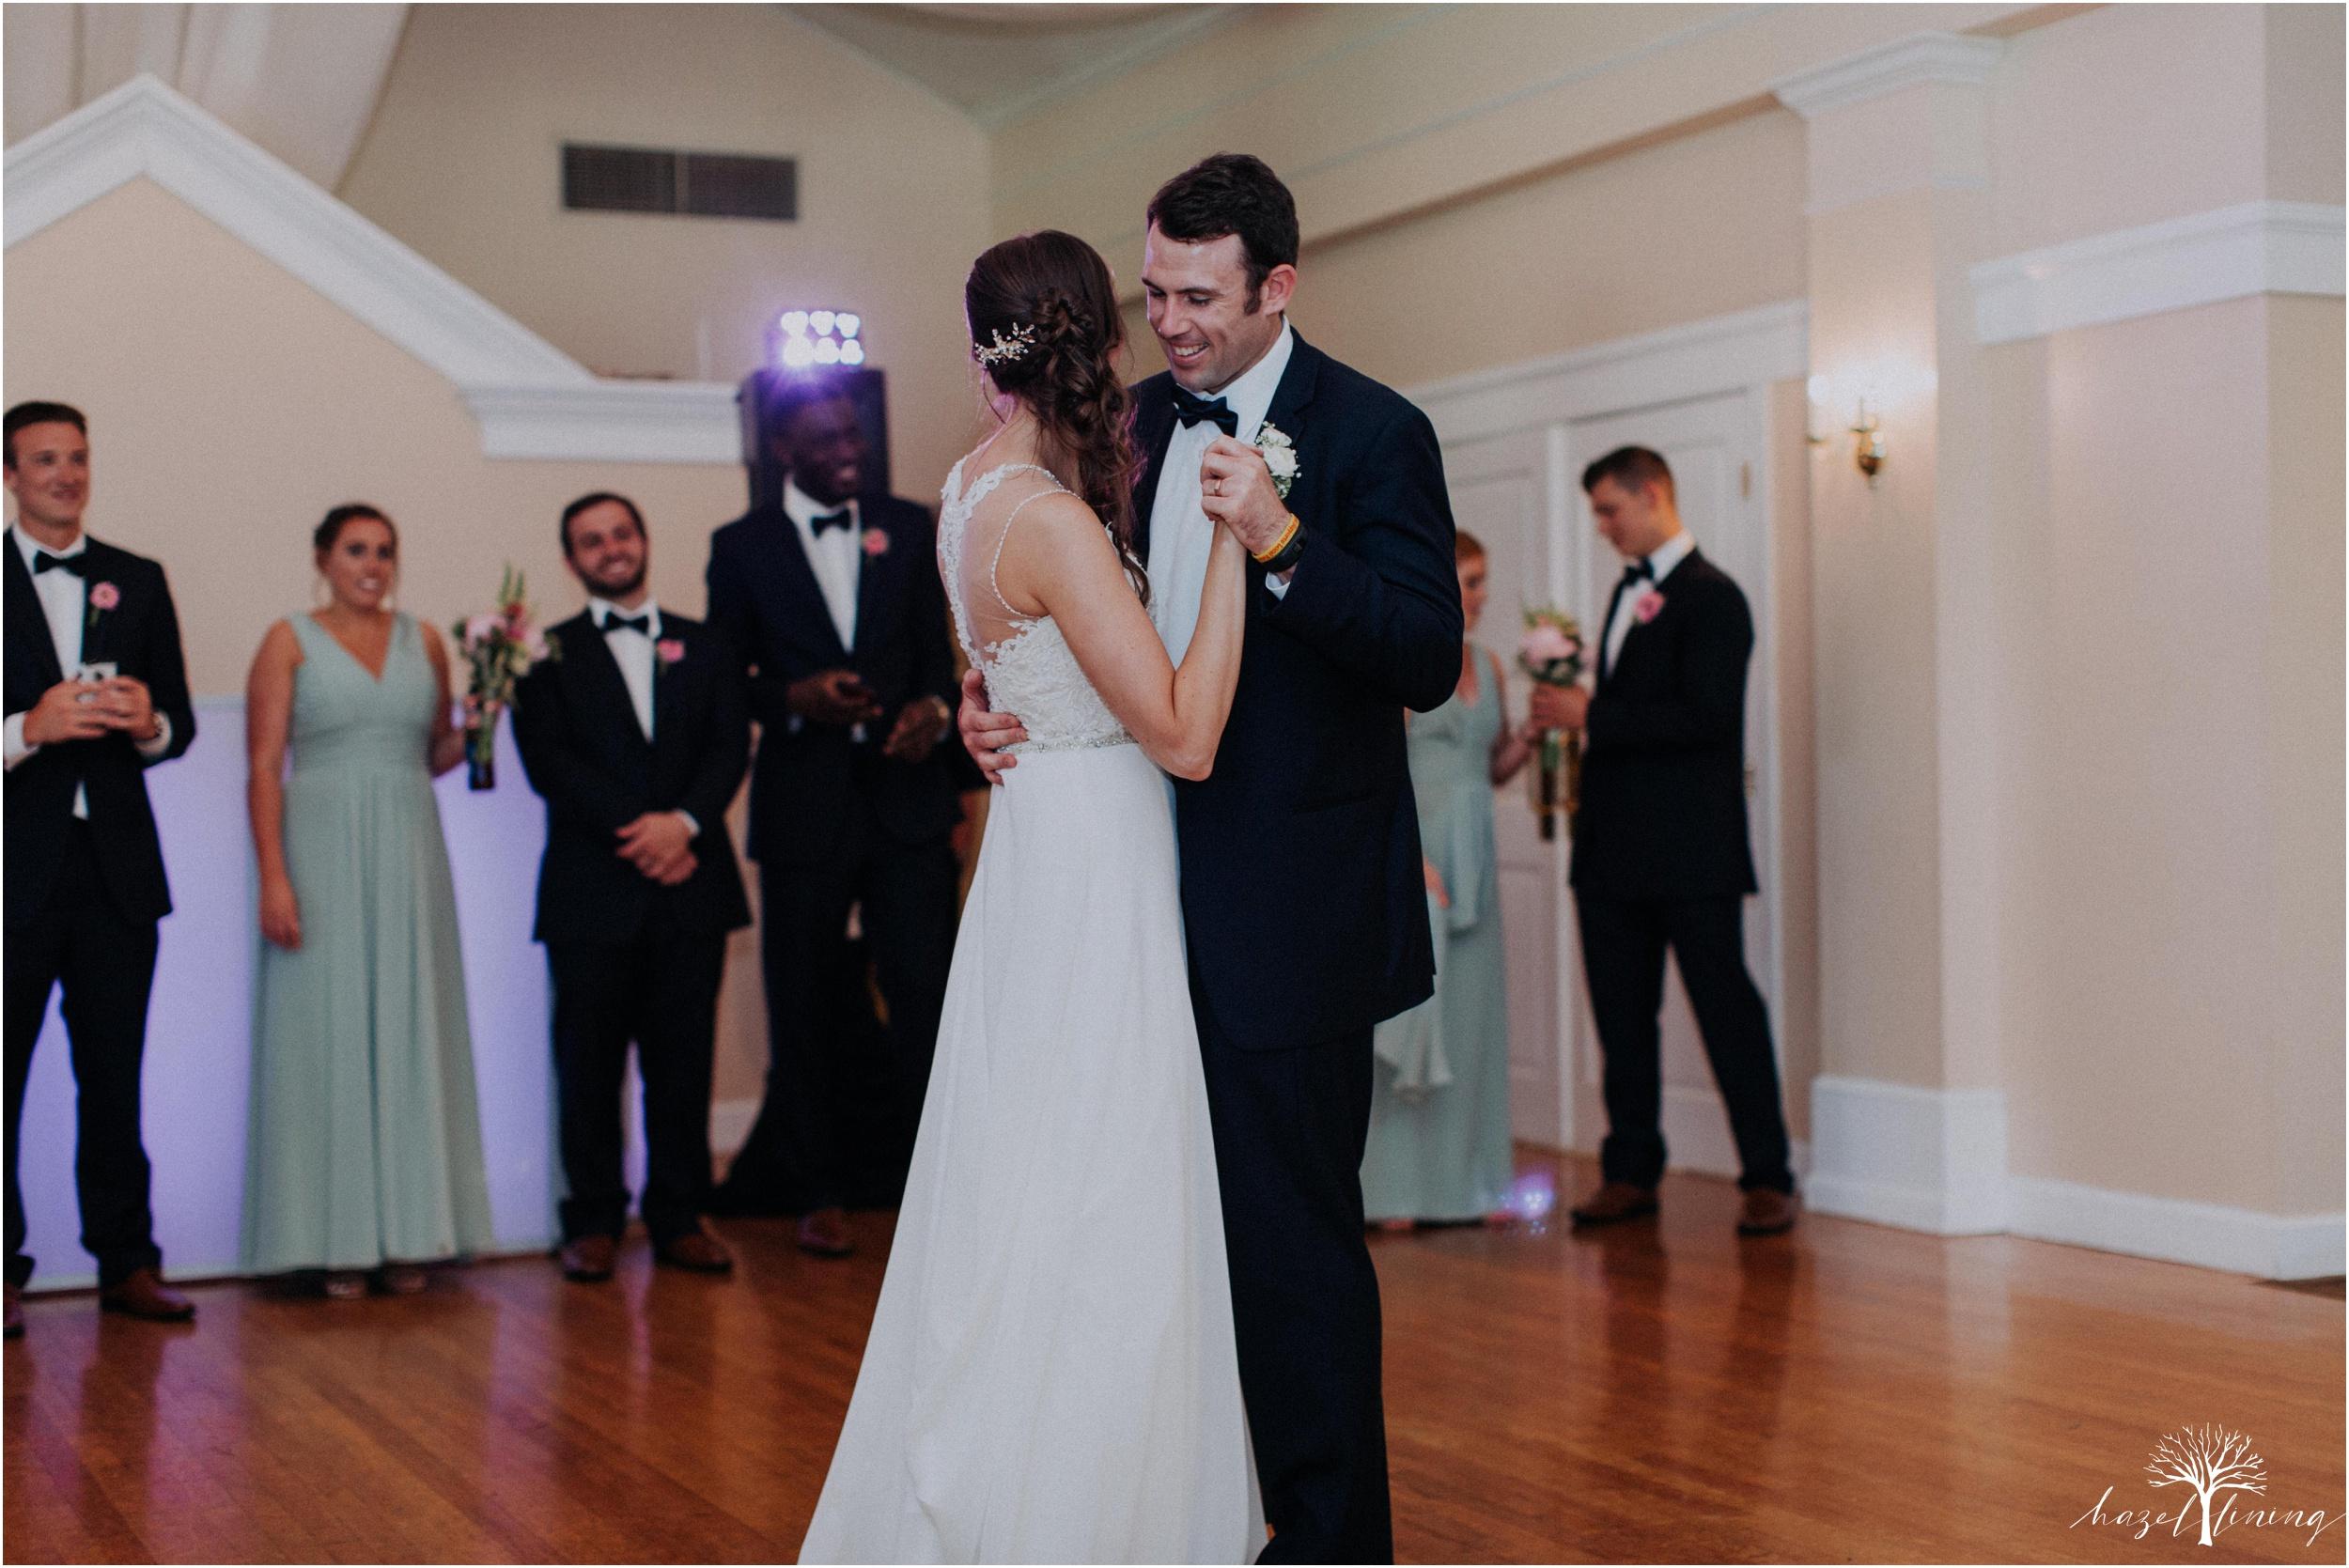 hazel-lining-travel-wedding-elopement-photography_0133.jpg